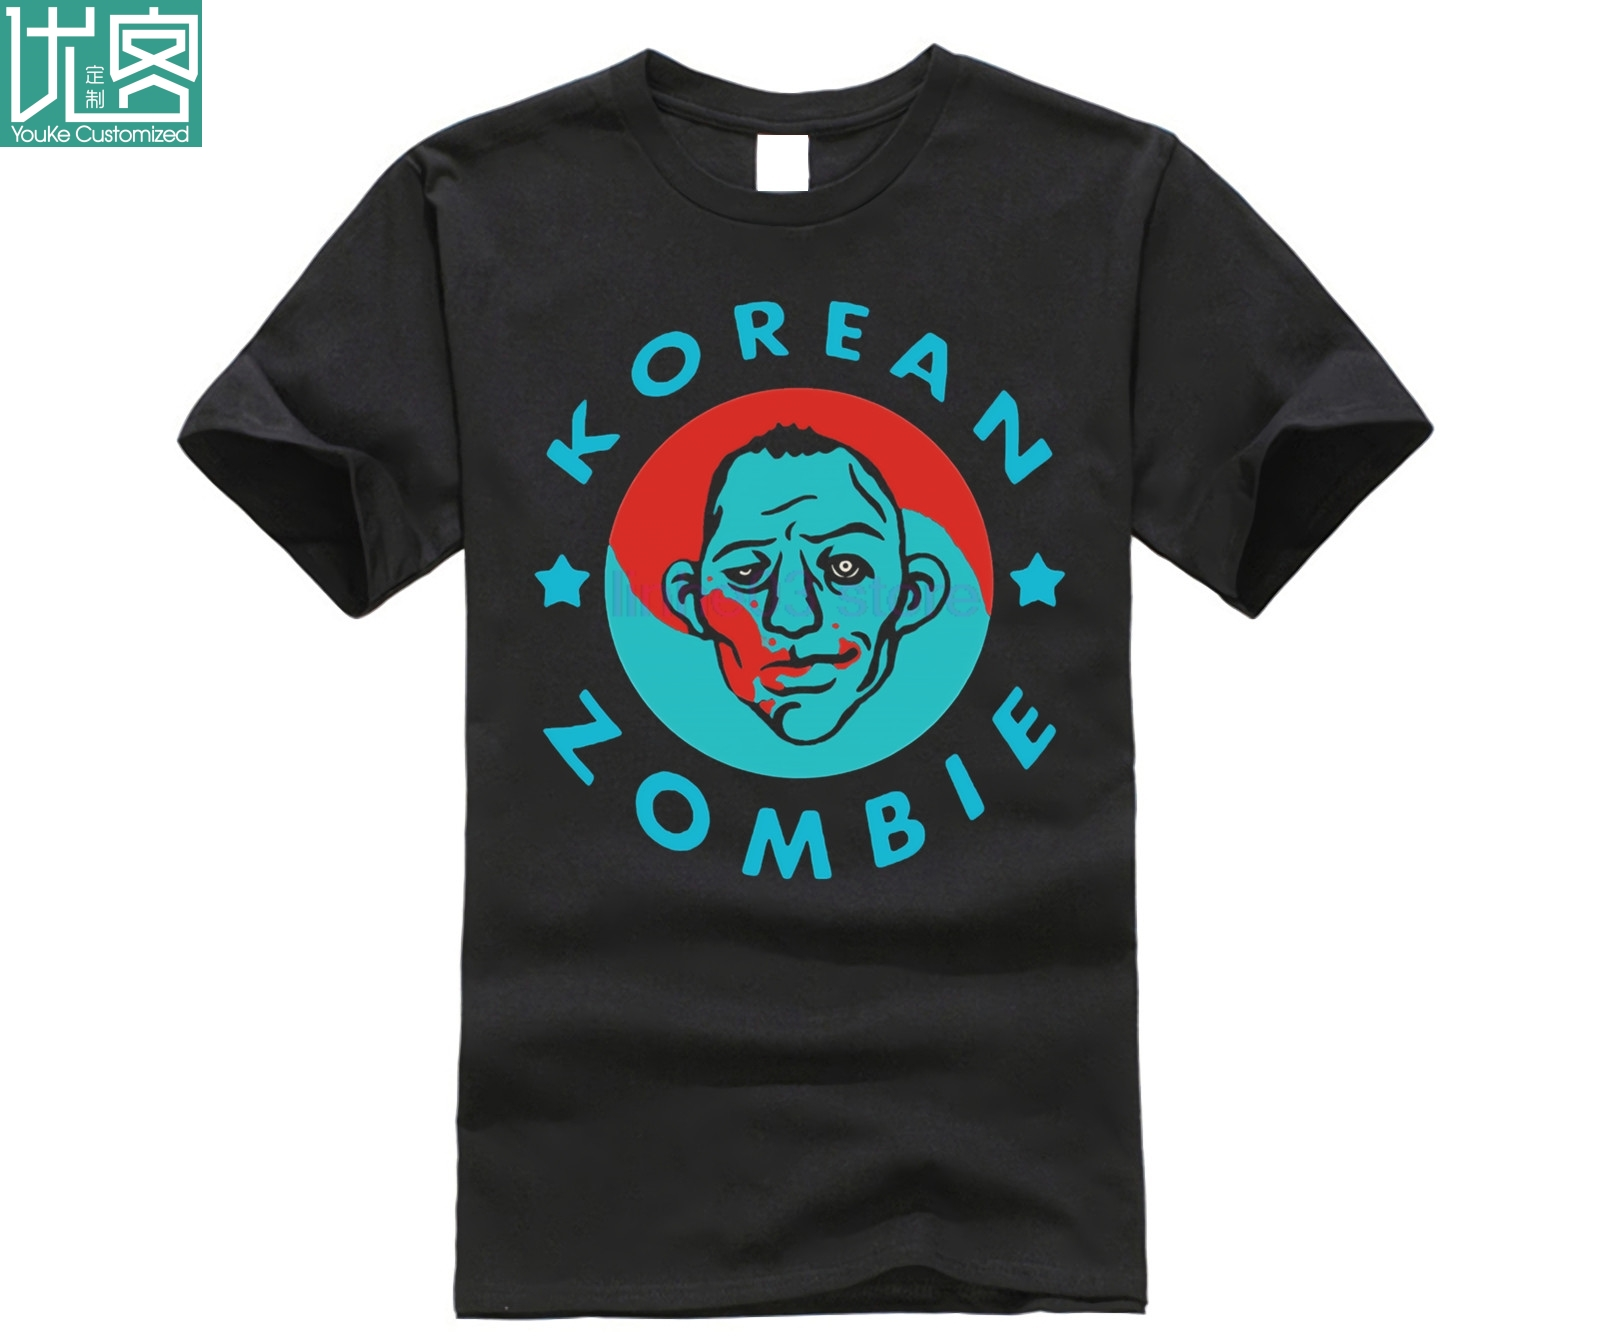 2019 New Brand Men T-Shirt Summer cotton Short Sleeve T Shirt KOREAN ZOMBIE SHIRT V1